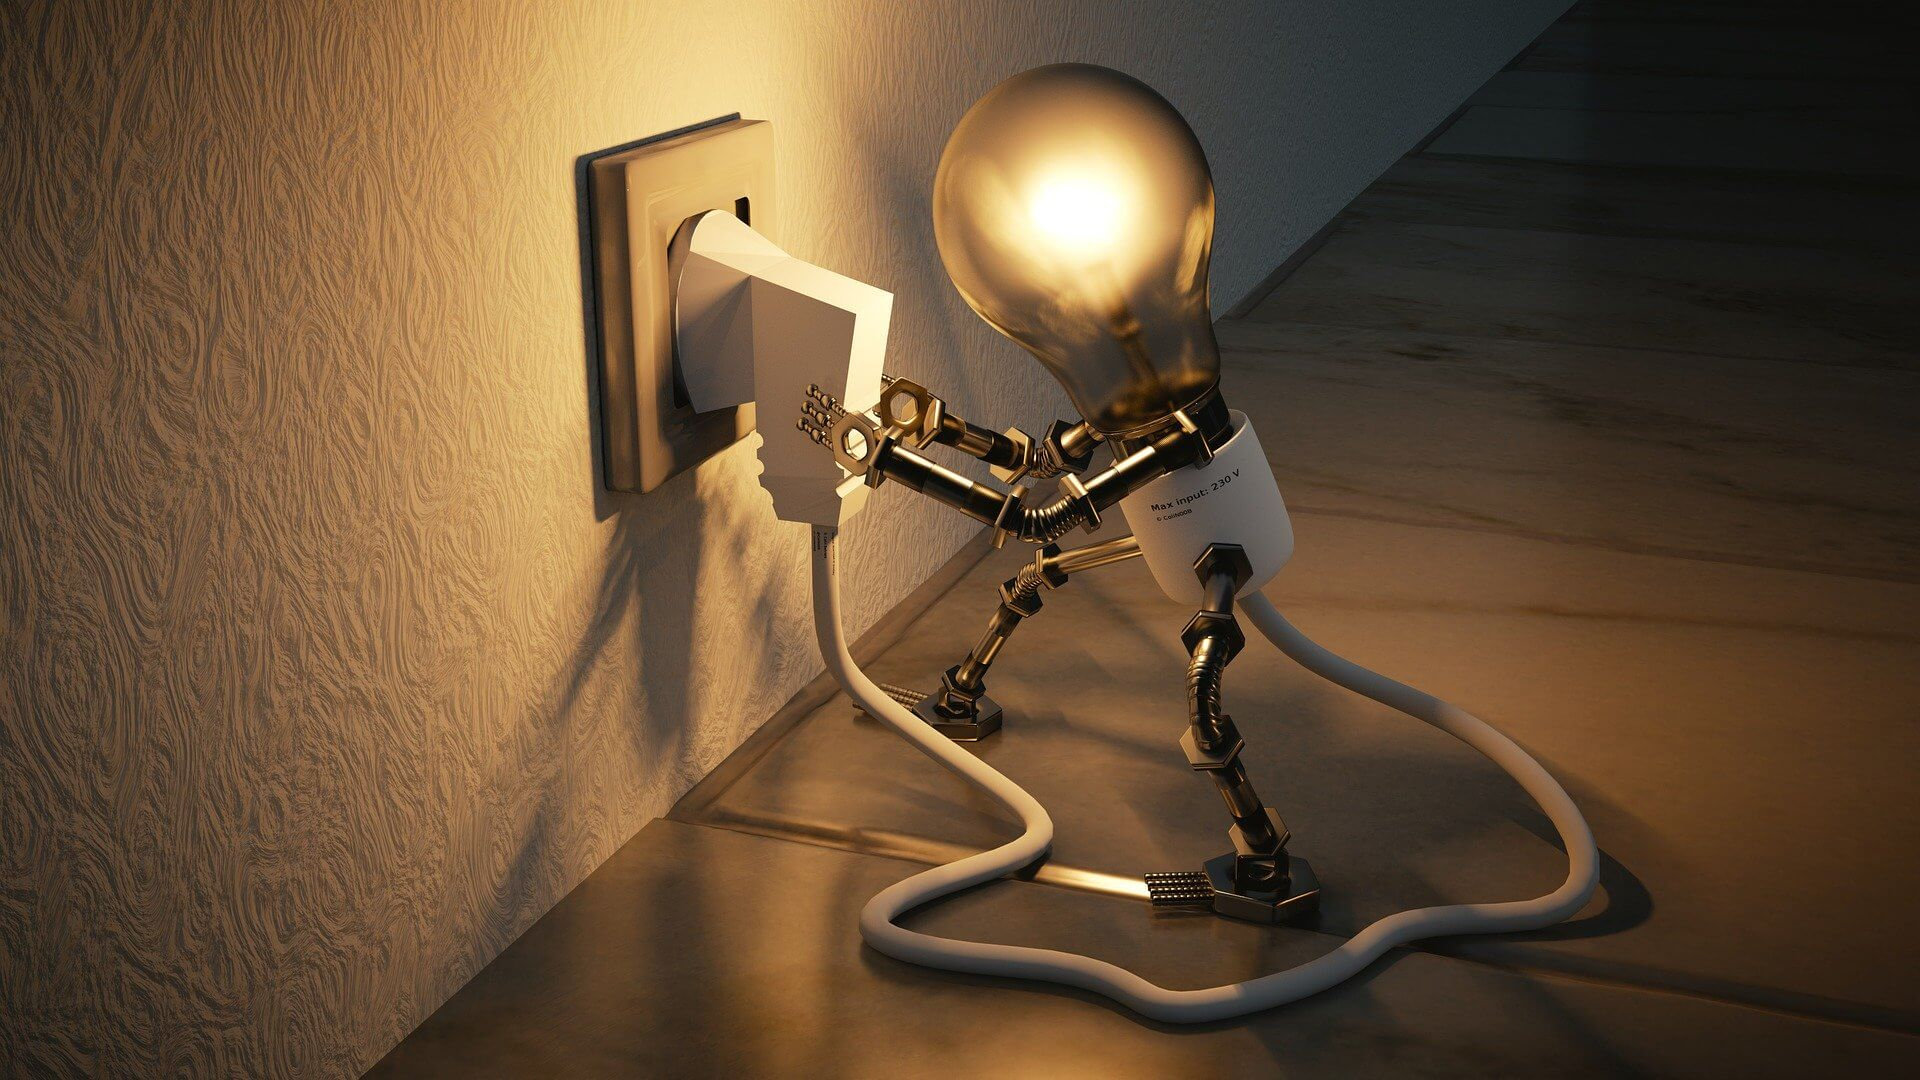 Cena kWh a MWh elektřiny - žárovka